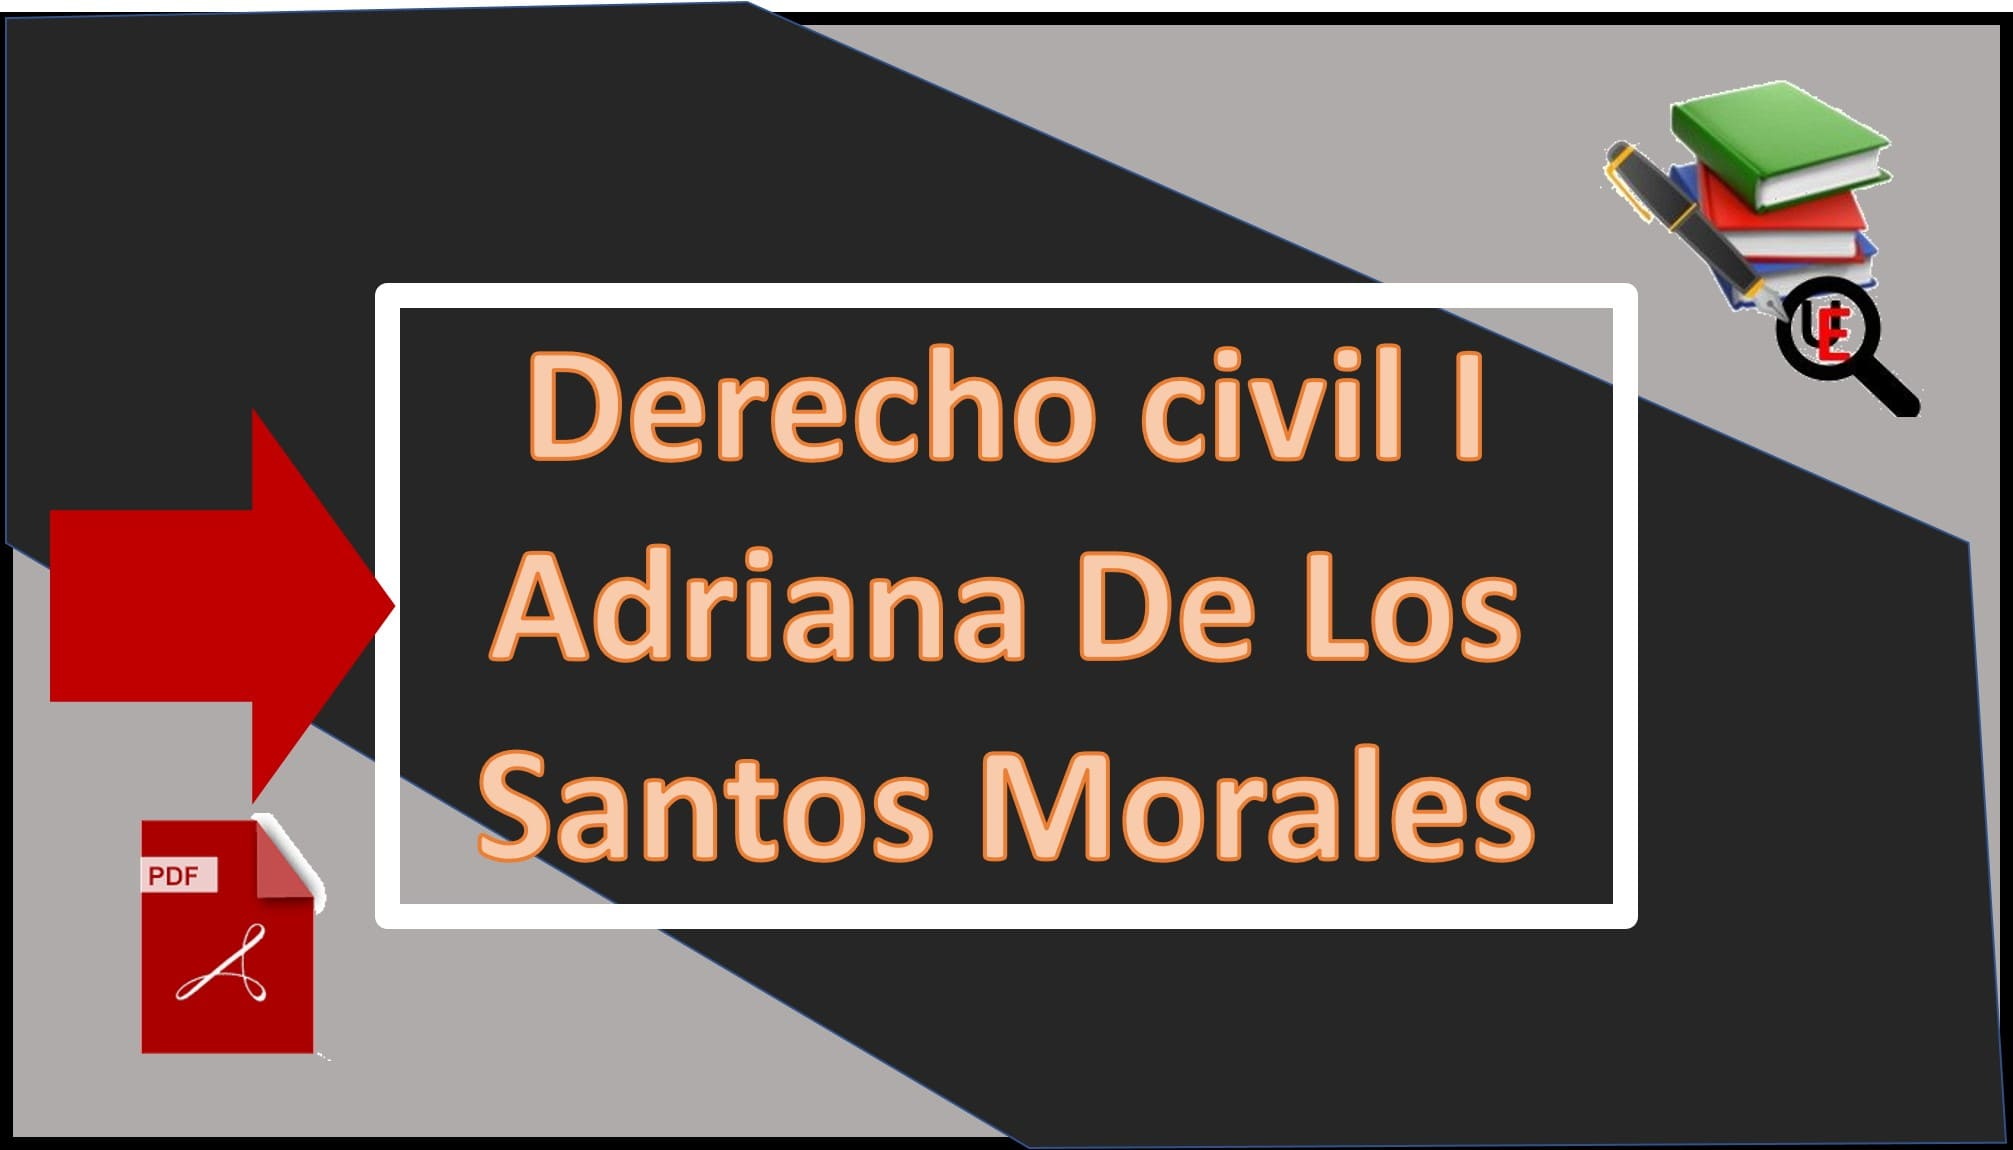 derecho civil 1 pdf